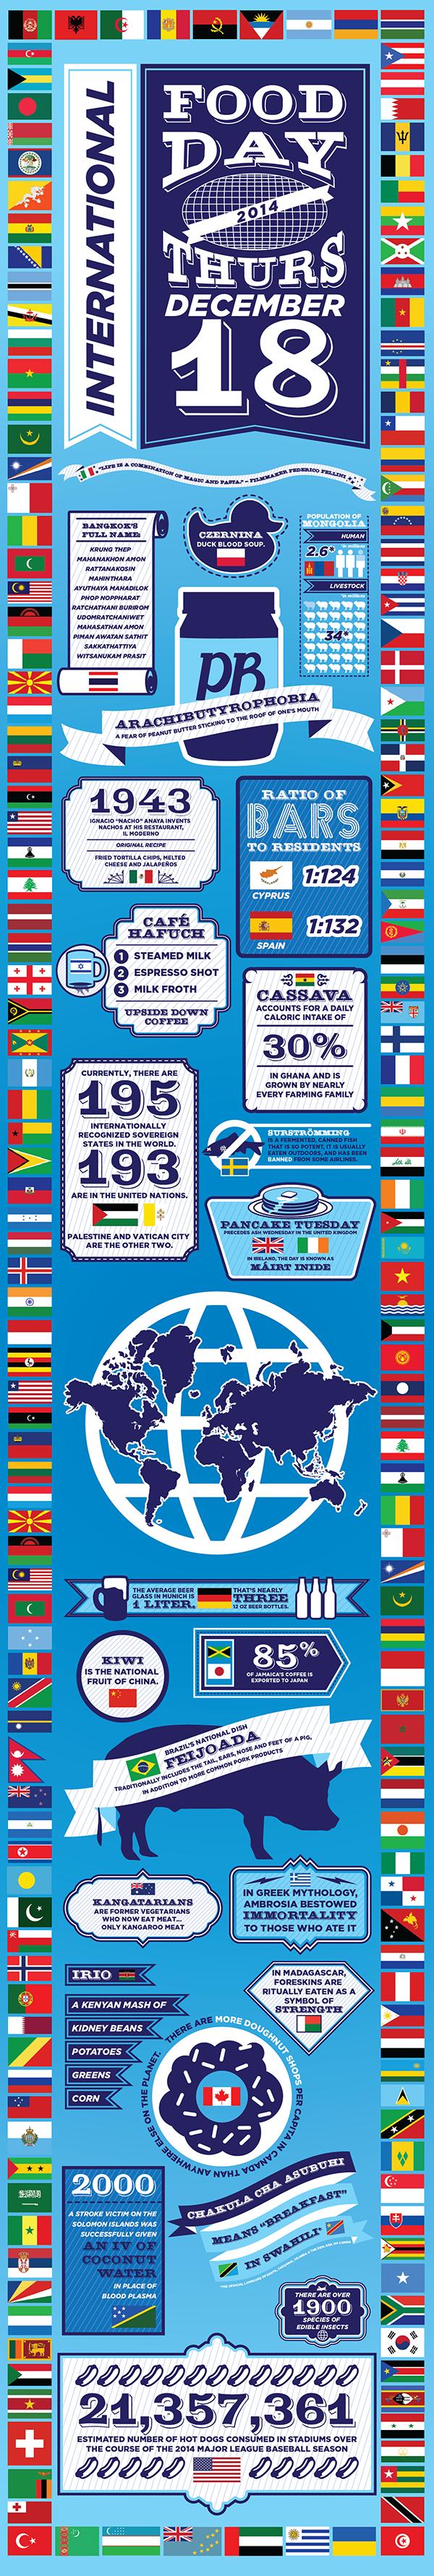 International Food Day: 2014